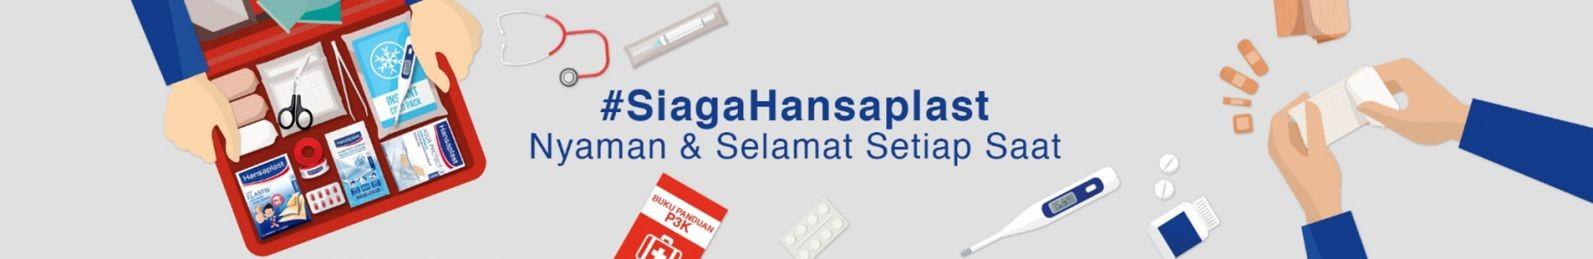 Hansaplast Official